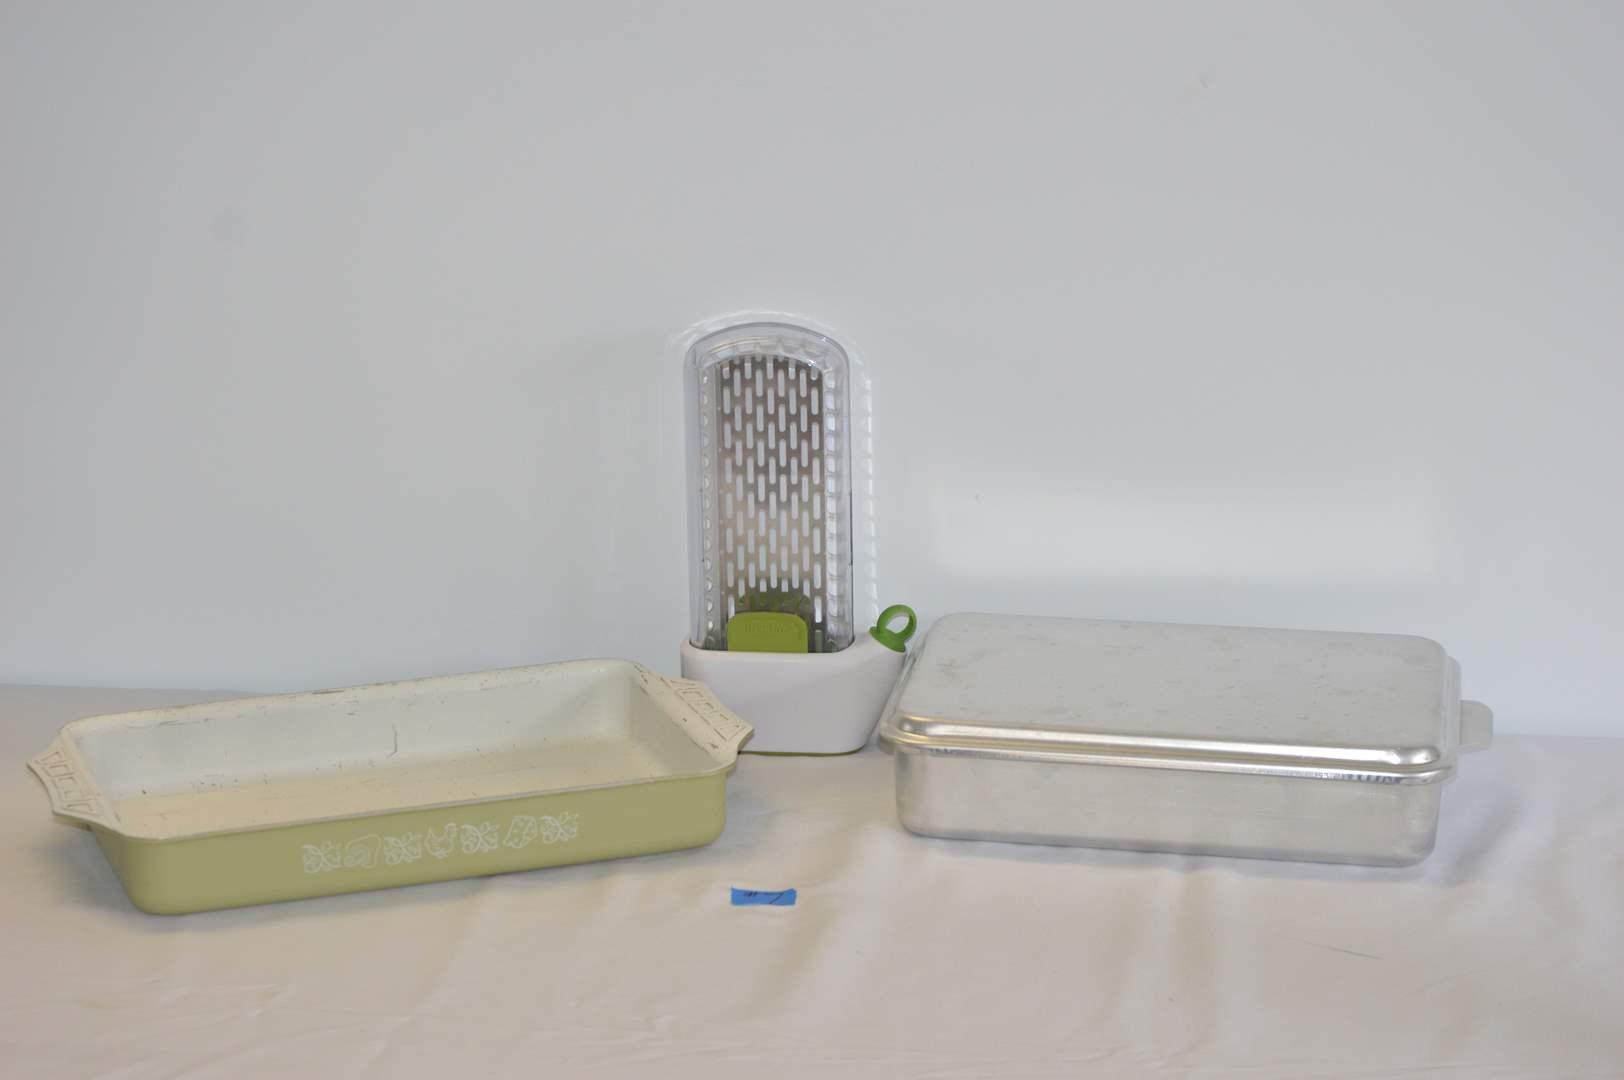 Lot # 7 Baking pans & Prepara shredder (main image)